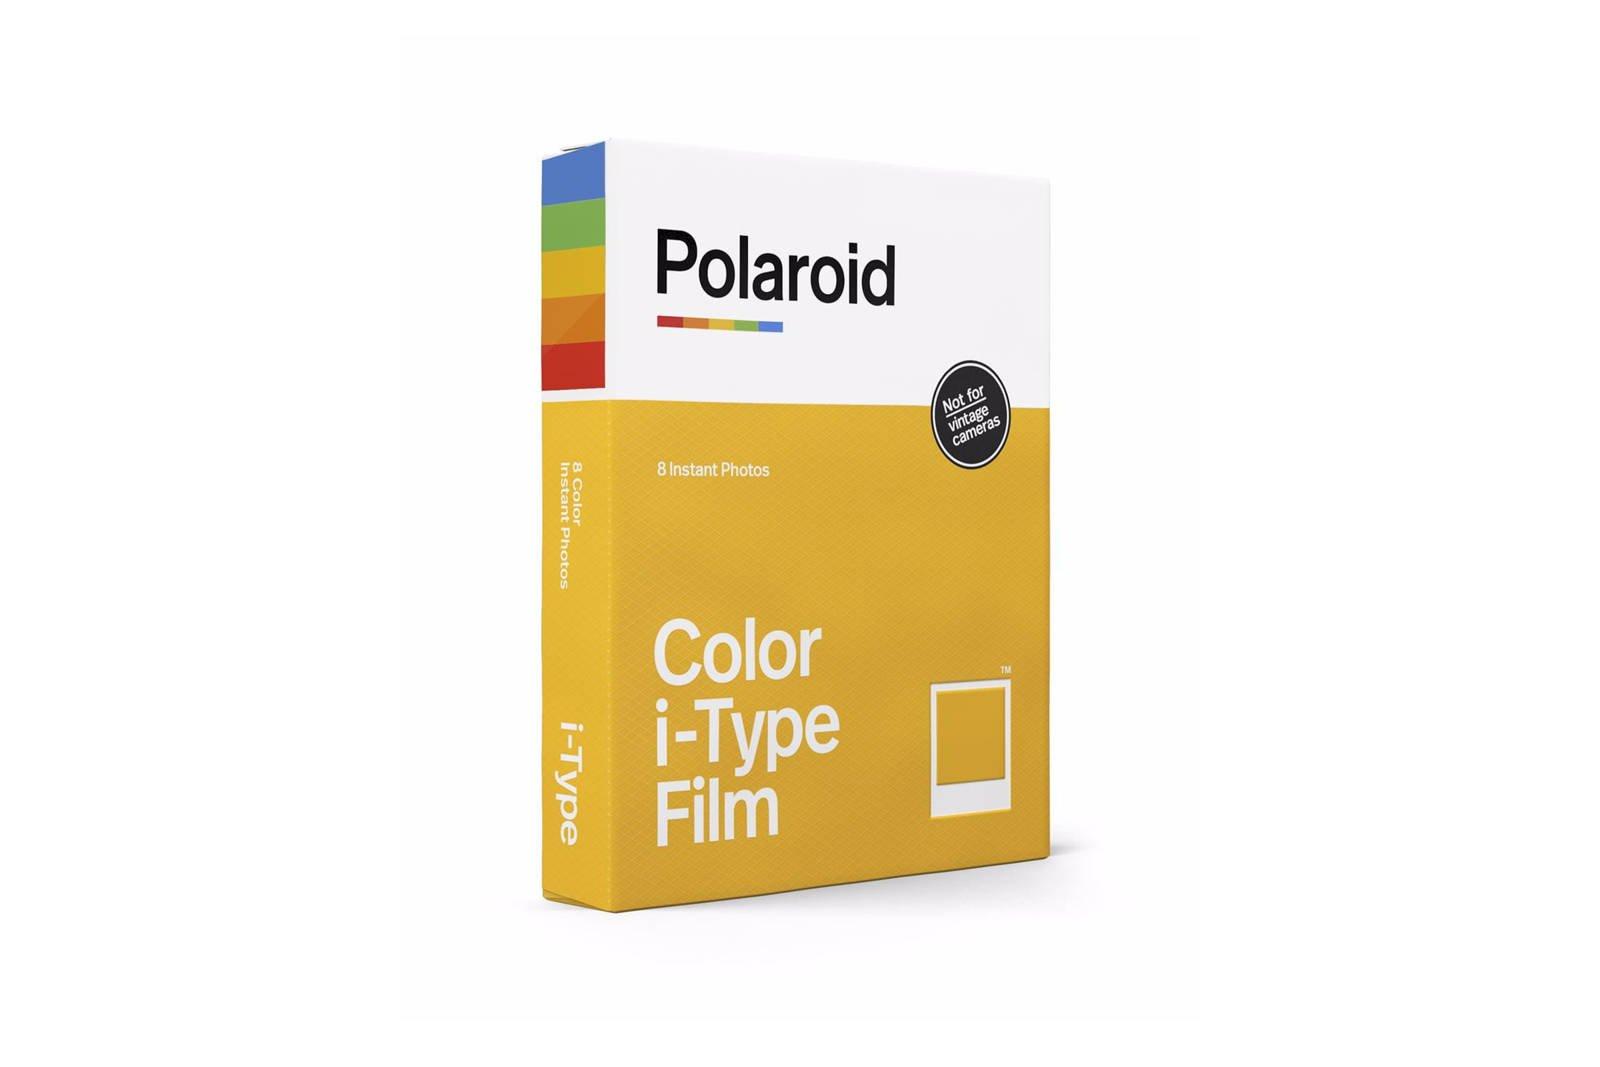 Polaroid Color i-Type Film 8 Instant Photos PRD006000